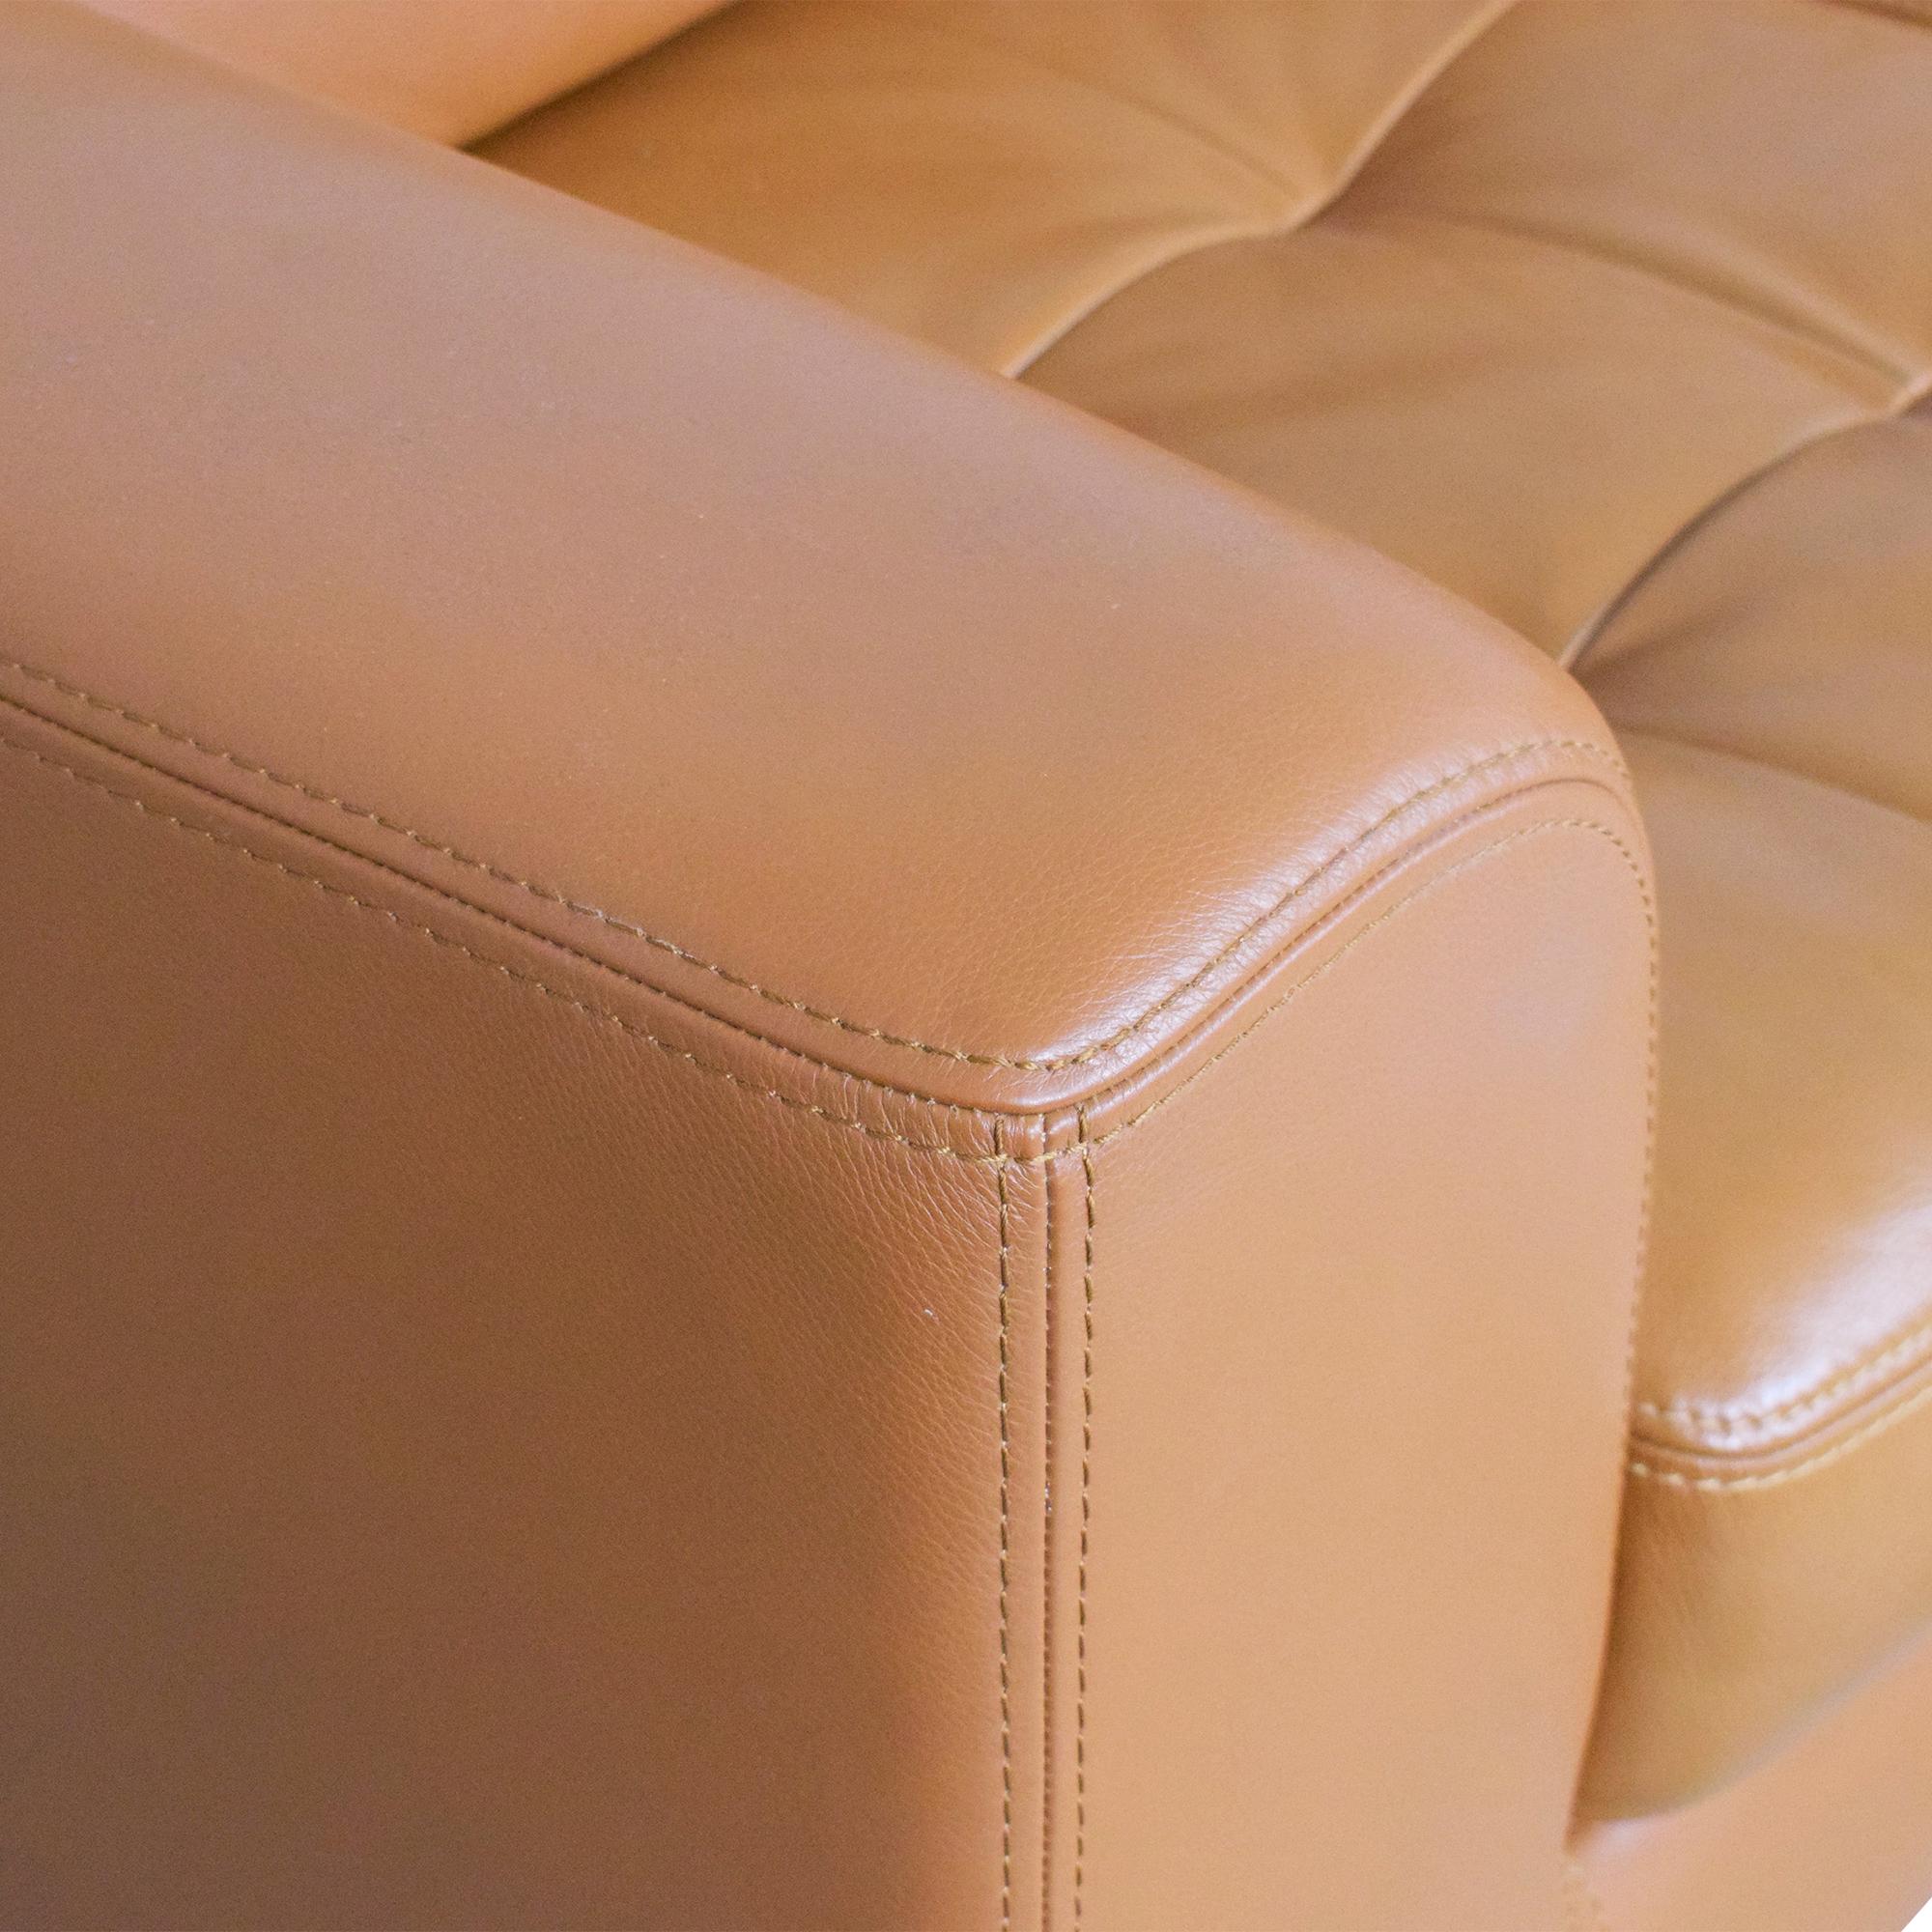 W. Schillig W. Schillig Three Cushion Sofa coupon